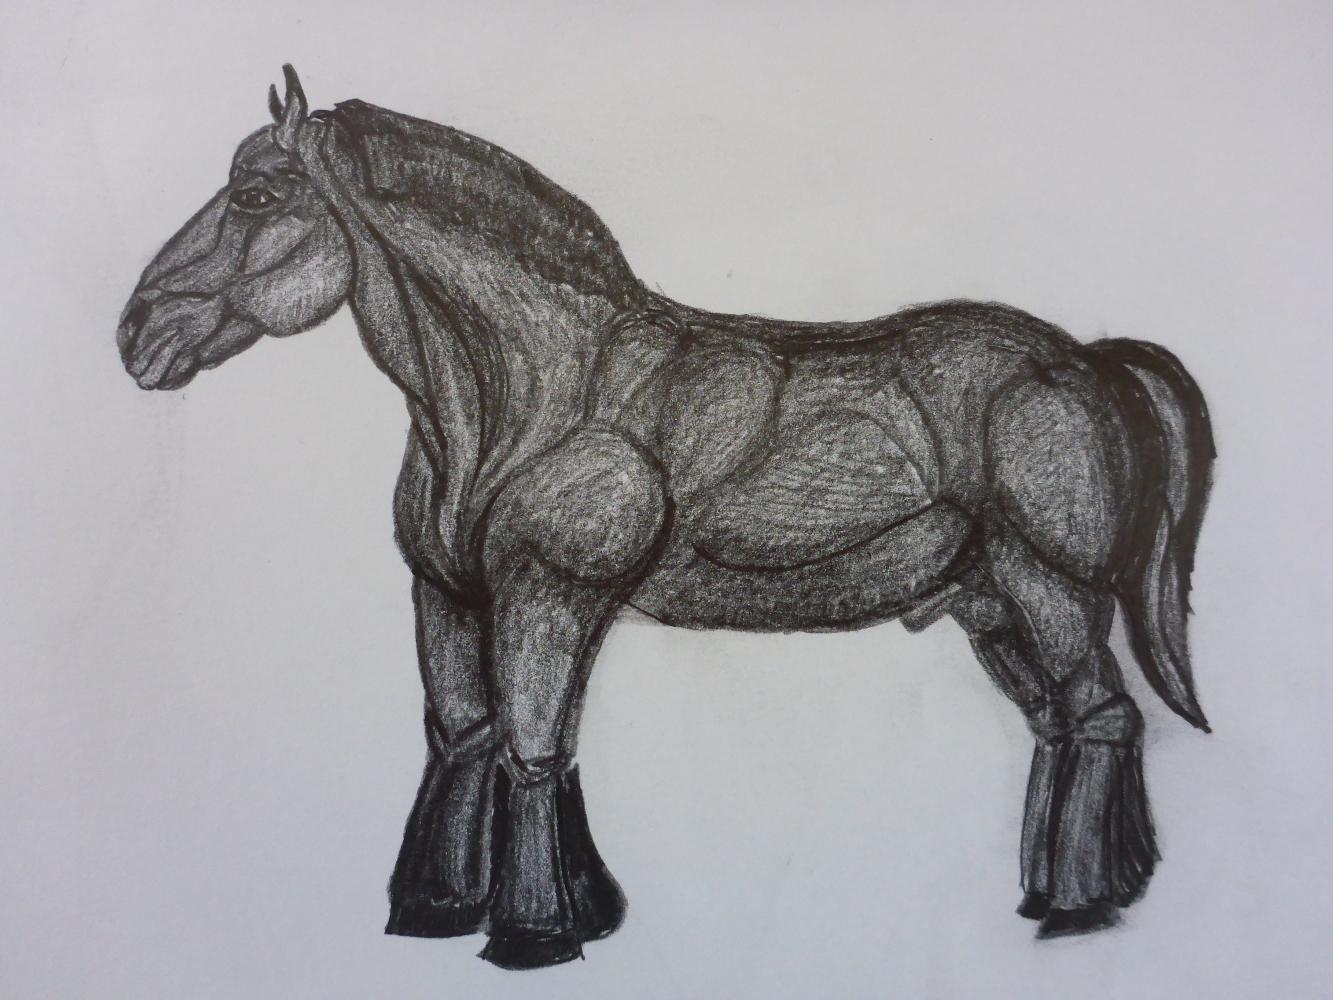 """Stallion III"", 2018, pencil on paper, 30 x 21 cm"